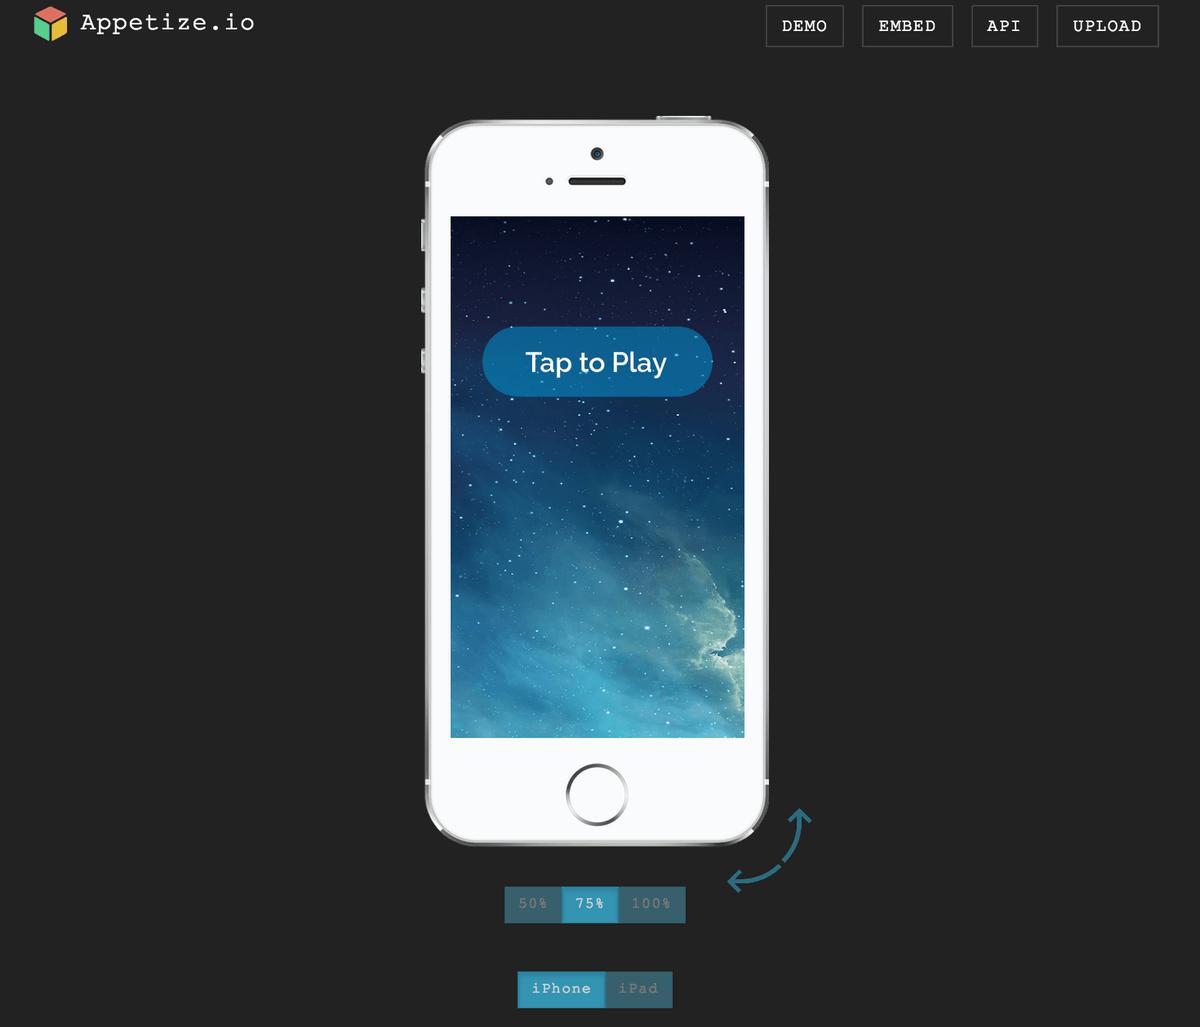 Appetize.io | Run iOS Apps On Windows 10 PC